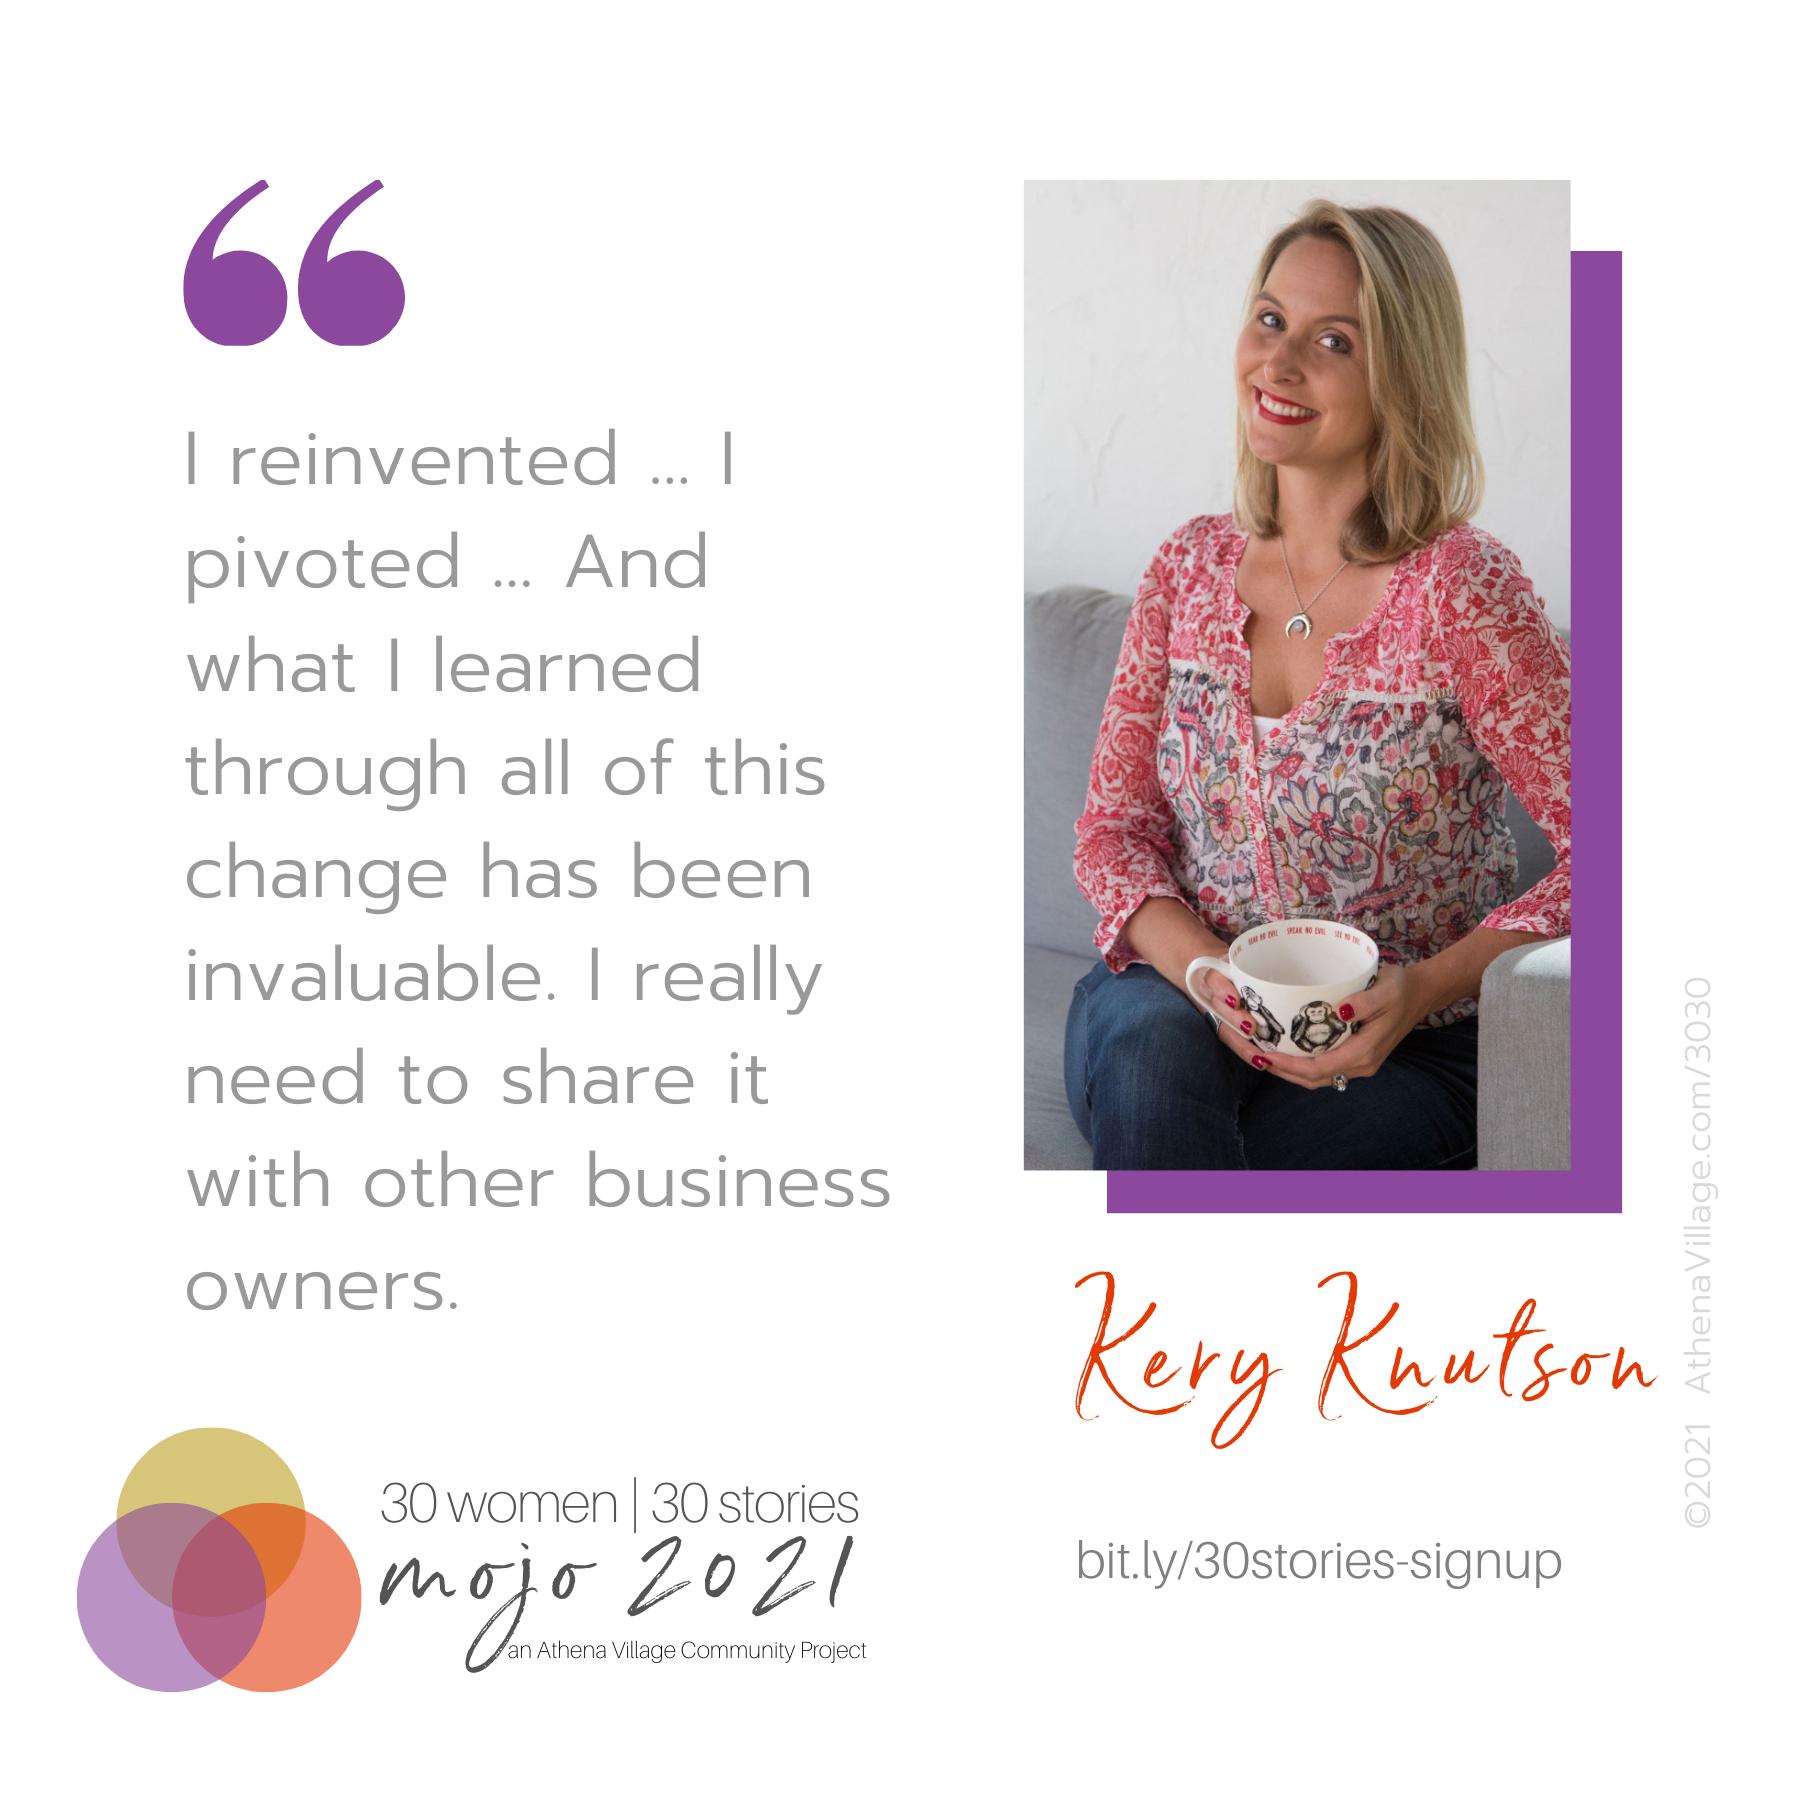 30 Women, 30 Stories: Meet Kery Knutson